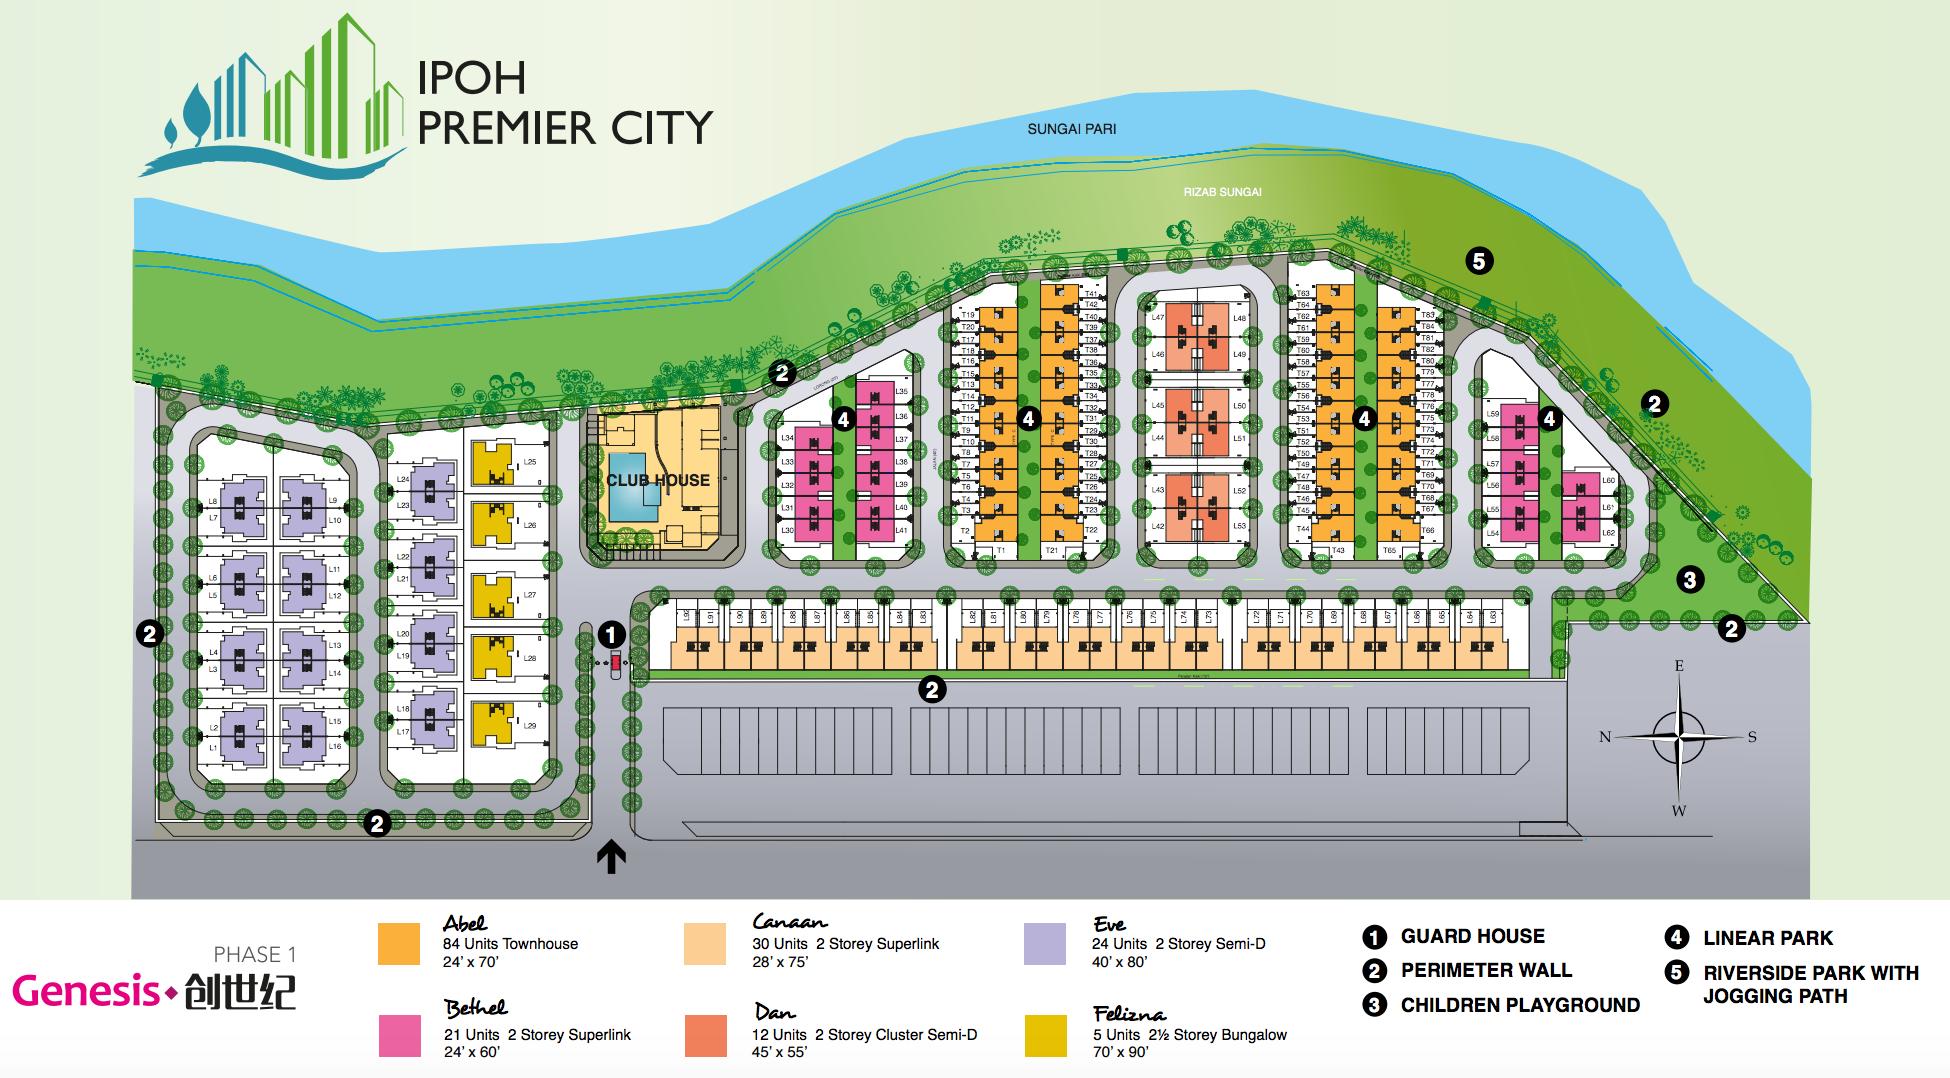 Site Plan of Ipoh Premier City